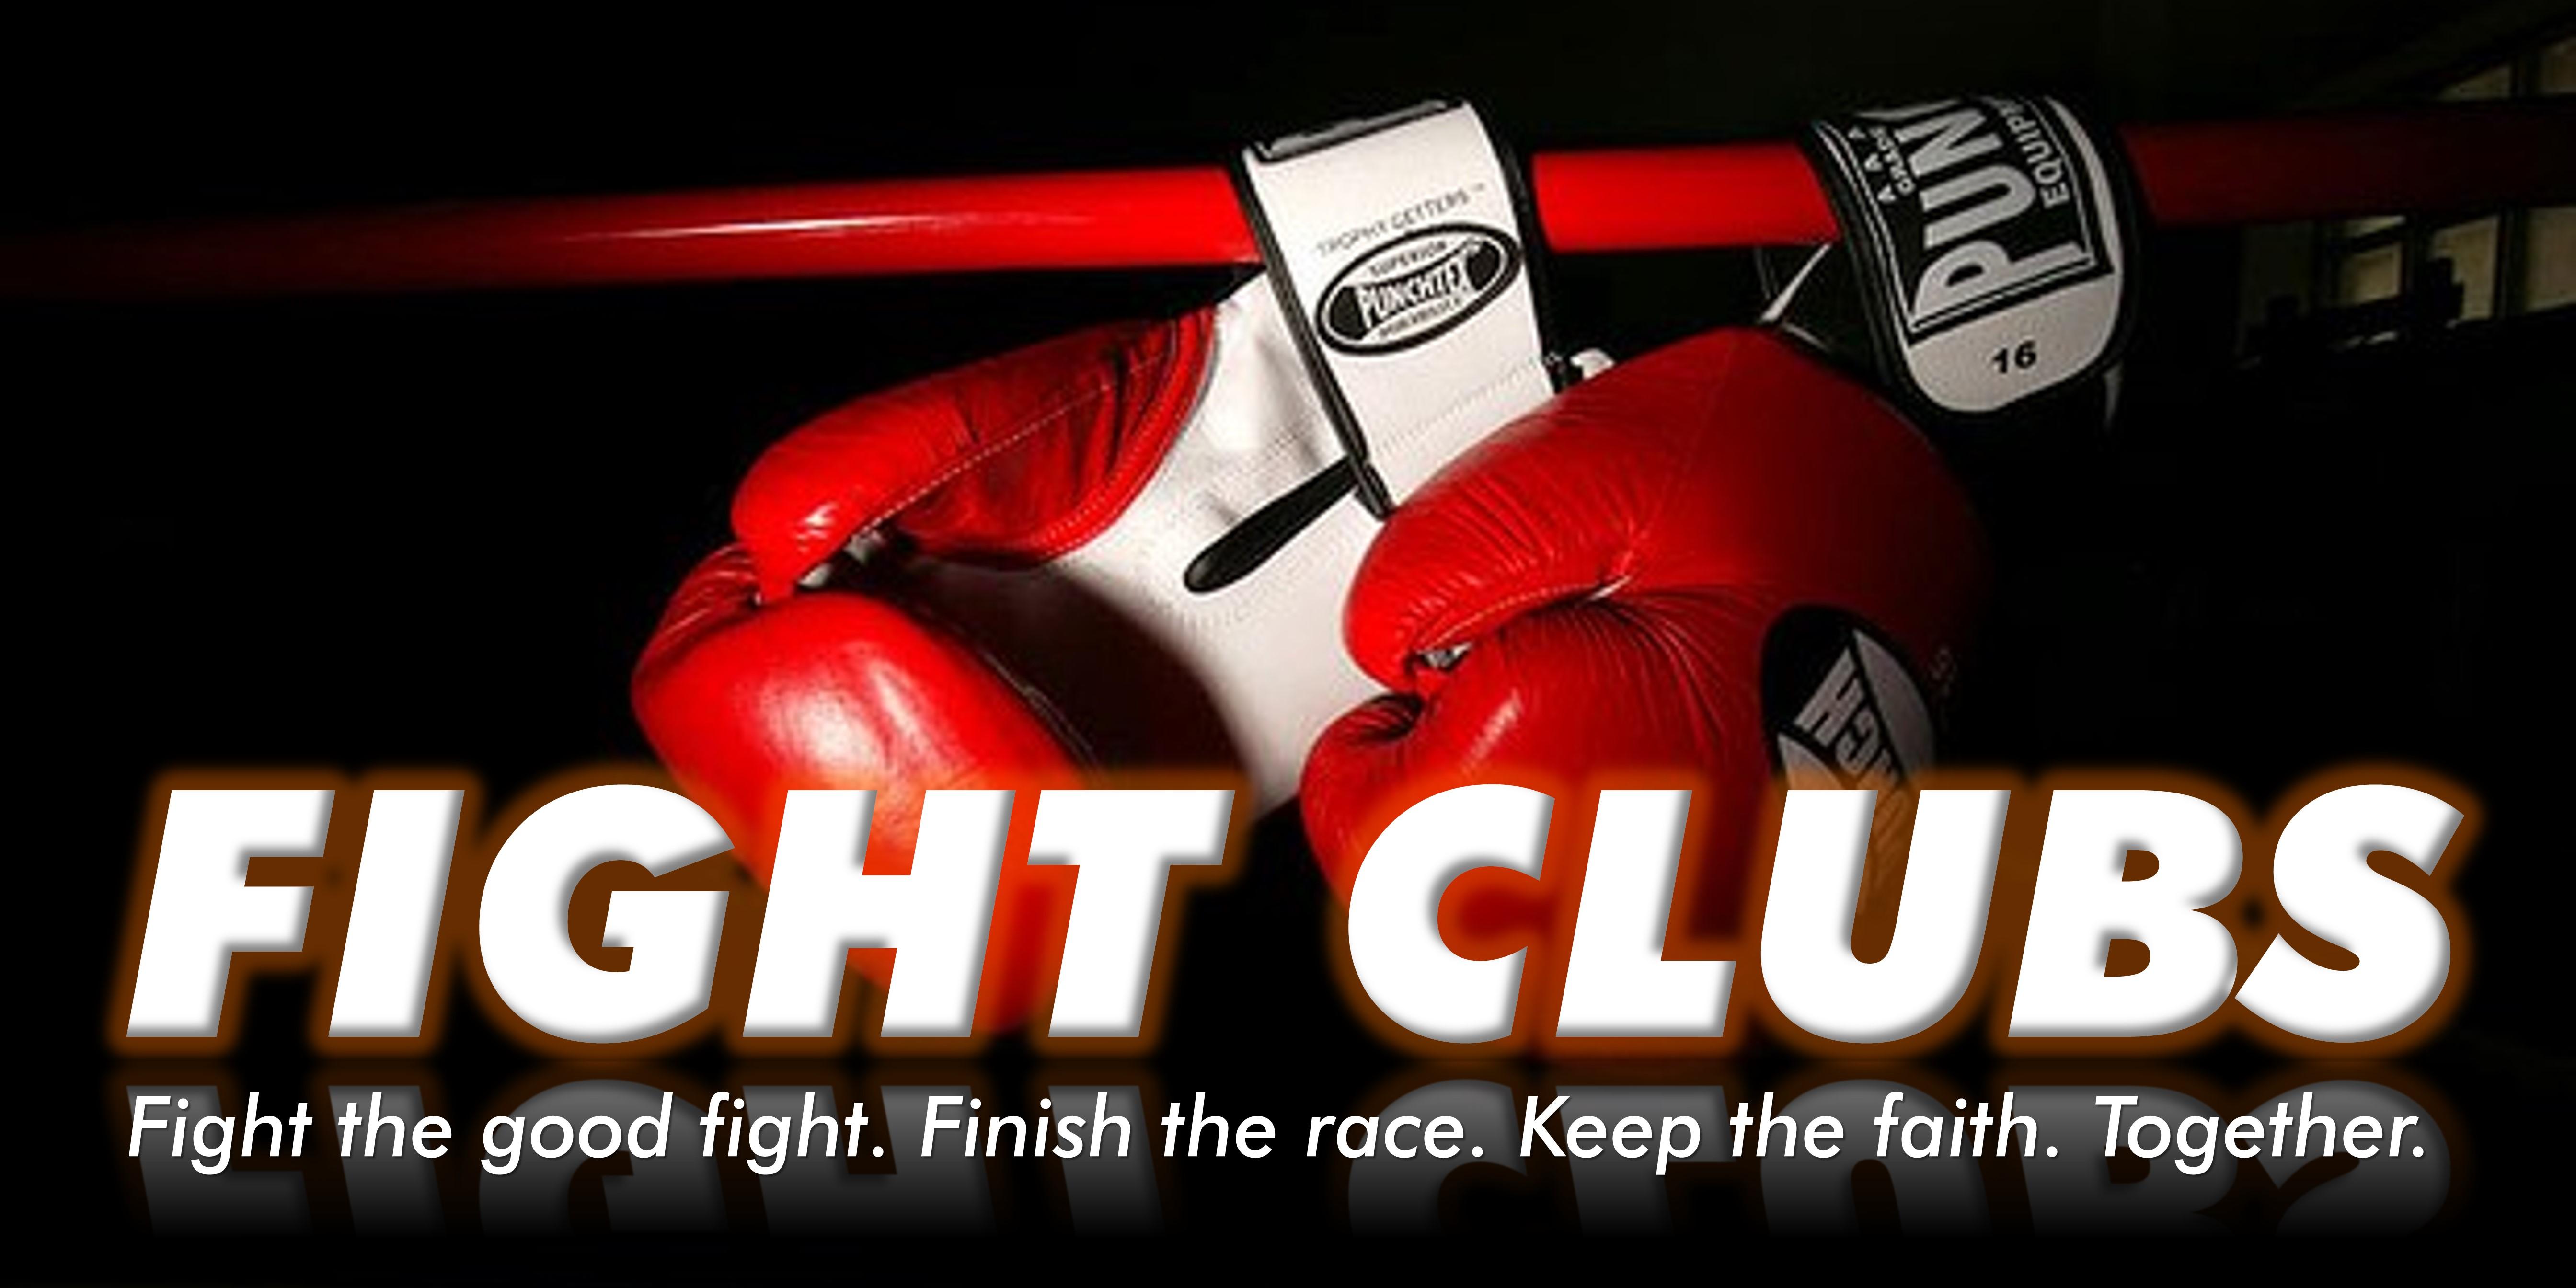 novel fight club linguistic Fight club (novel), the 1996 novel by chuck palahniuk fight club (film), the  1999 film, directed by  fight club (video game), the 2004 fighting video game.